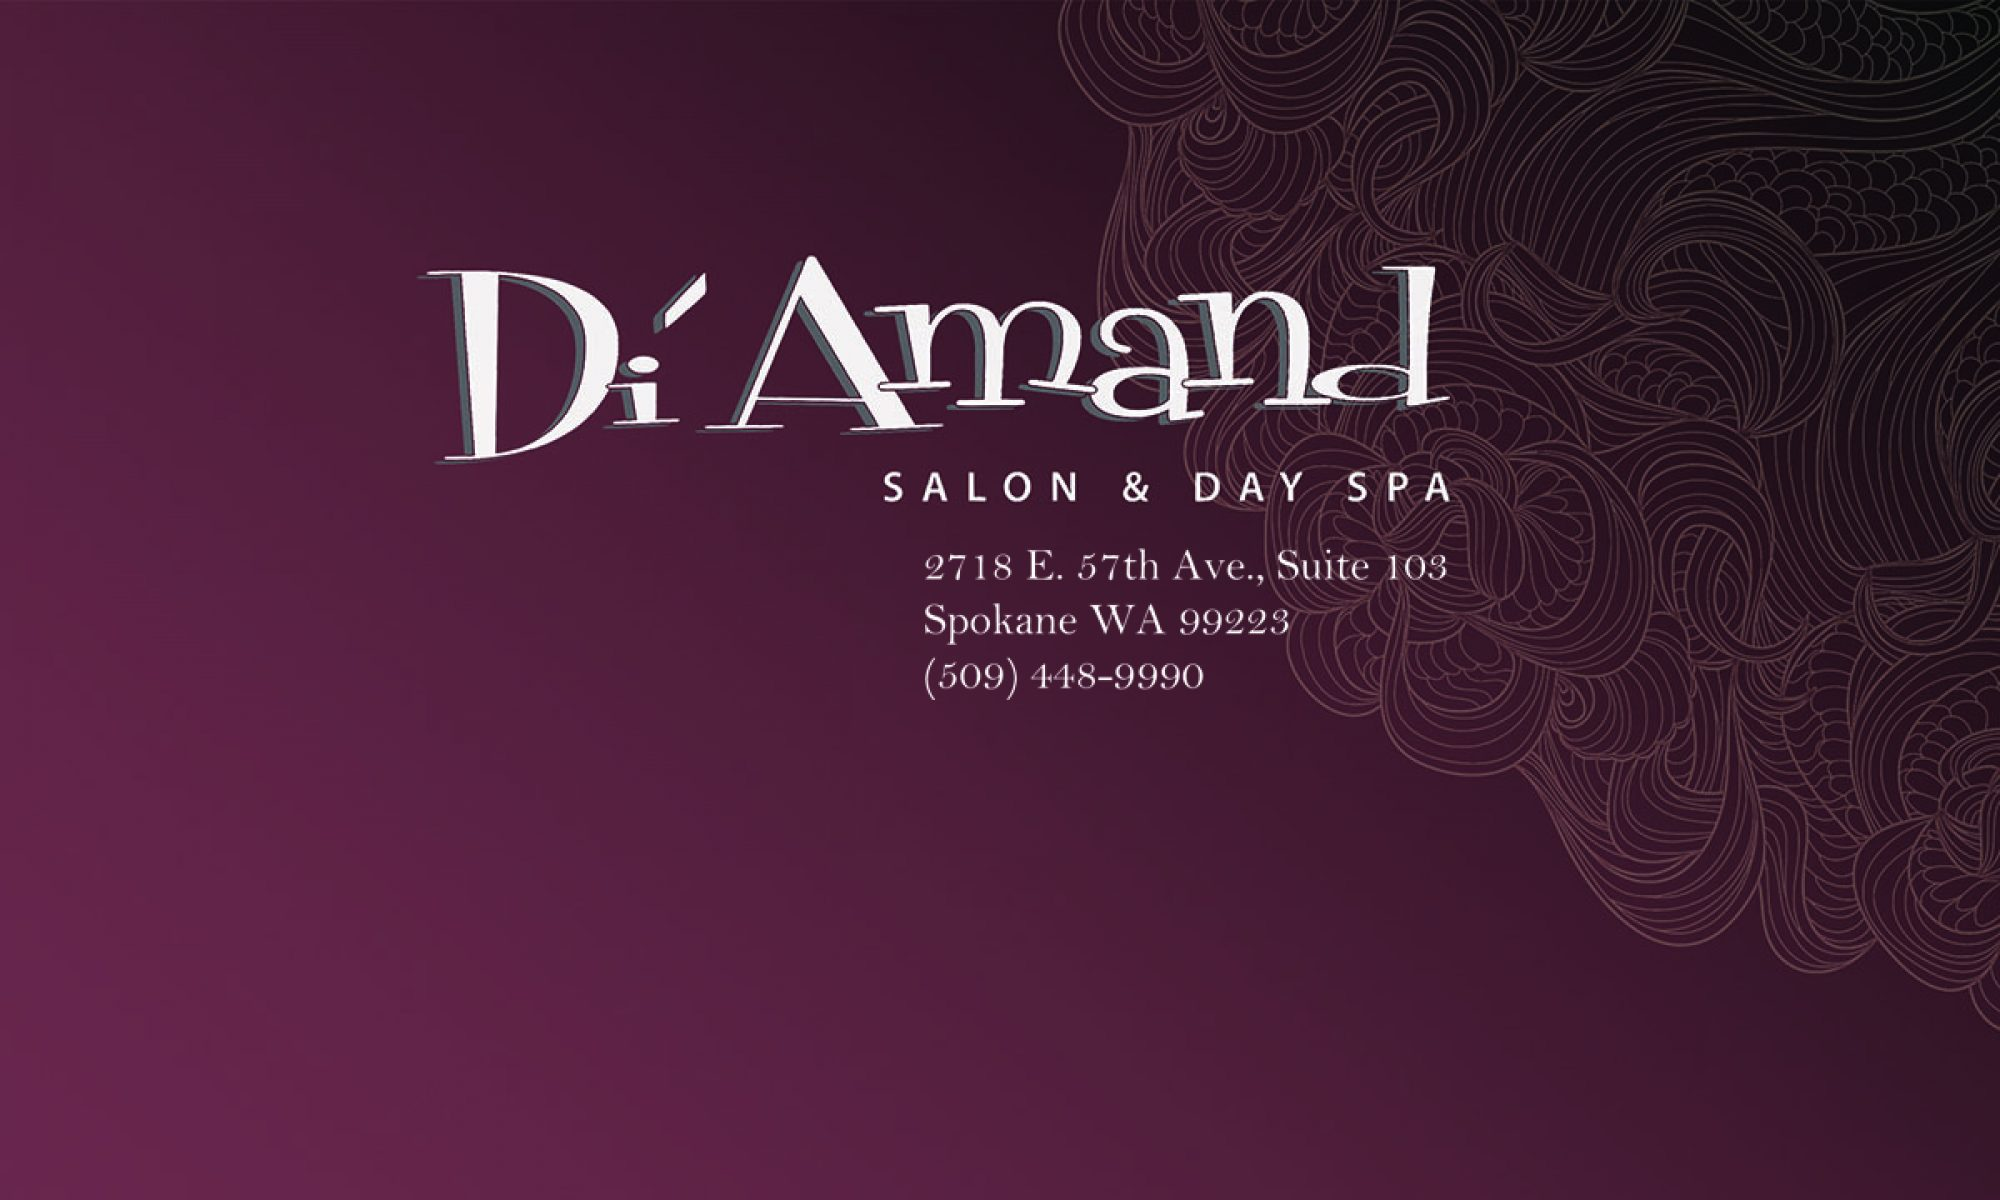 Di'Amand Day Spa Salon & Tanning